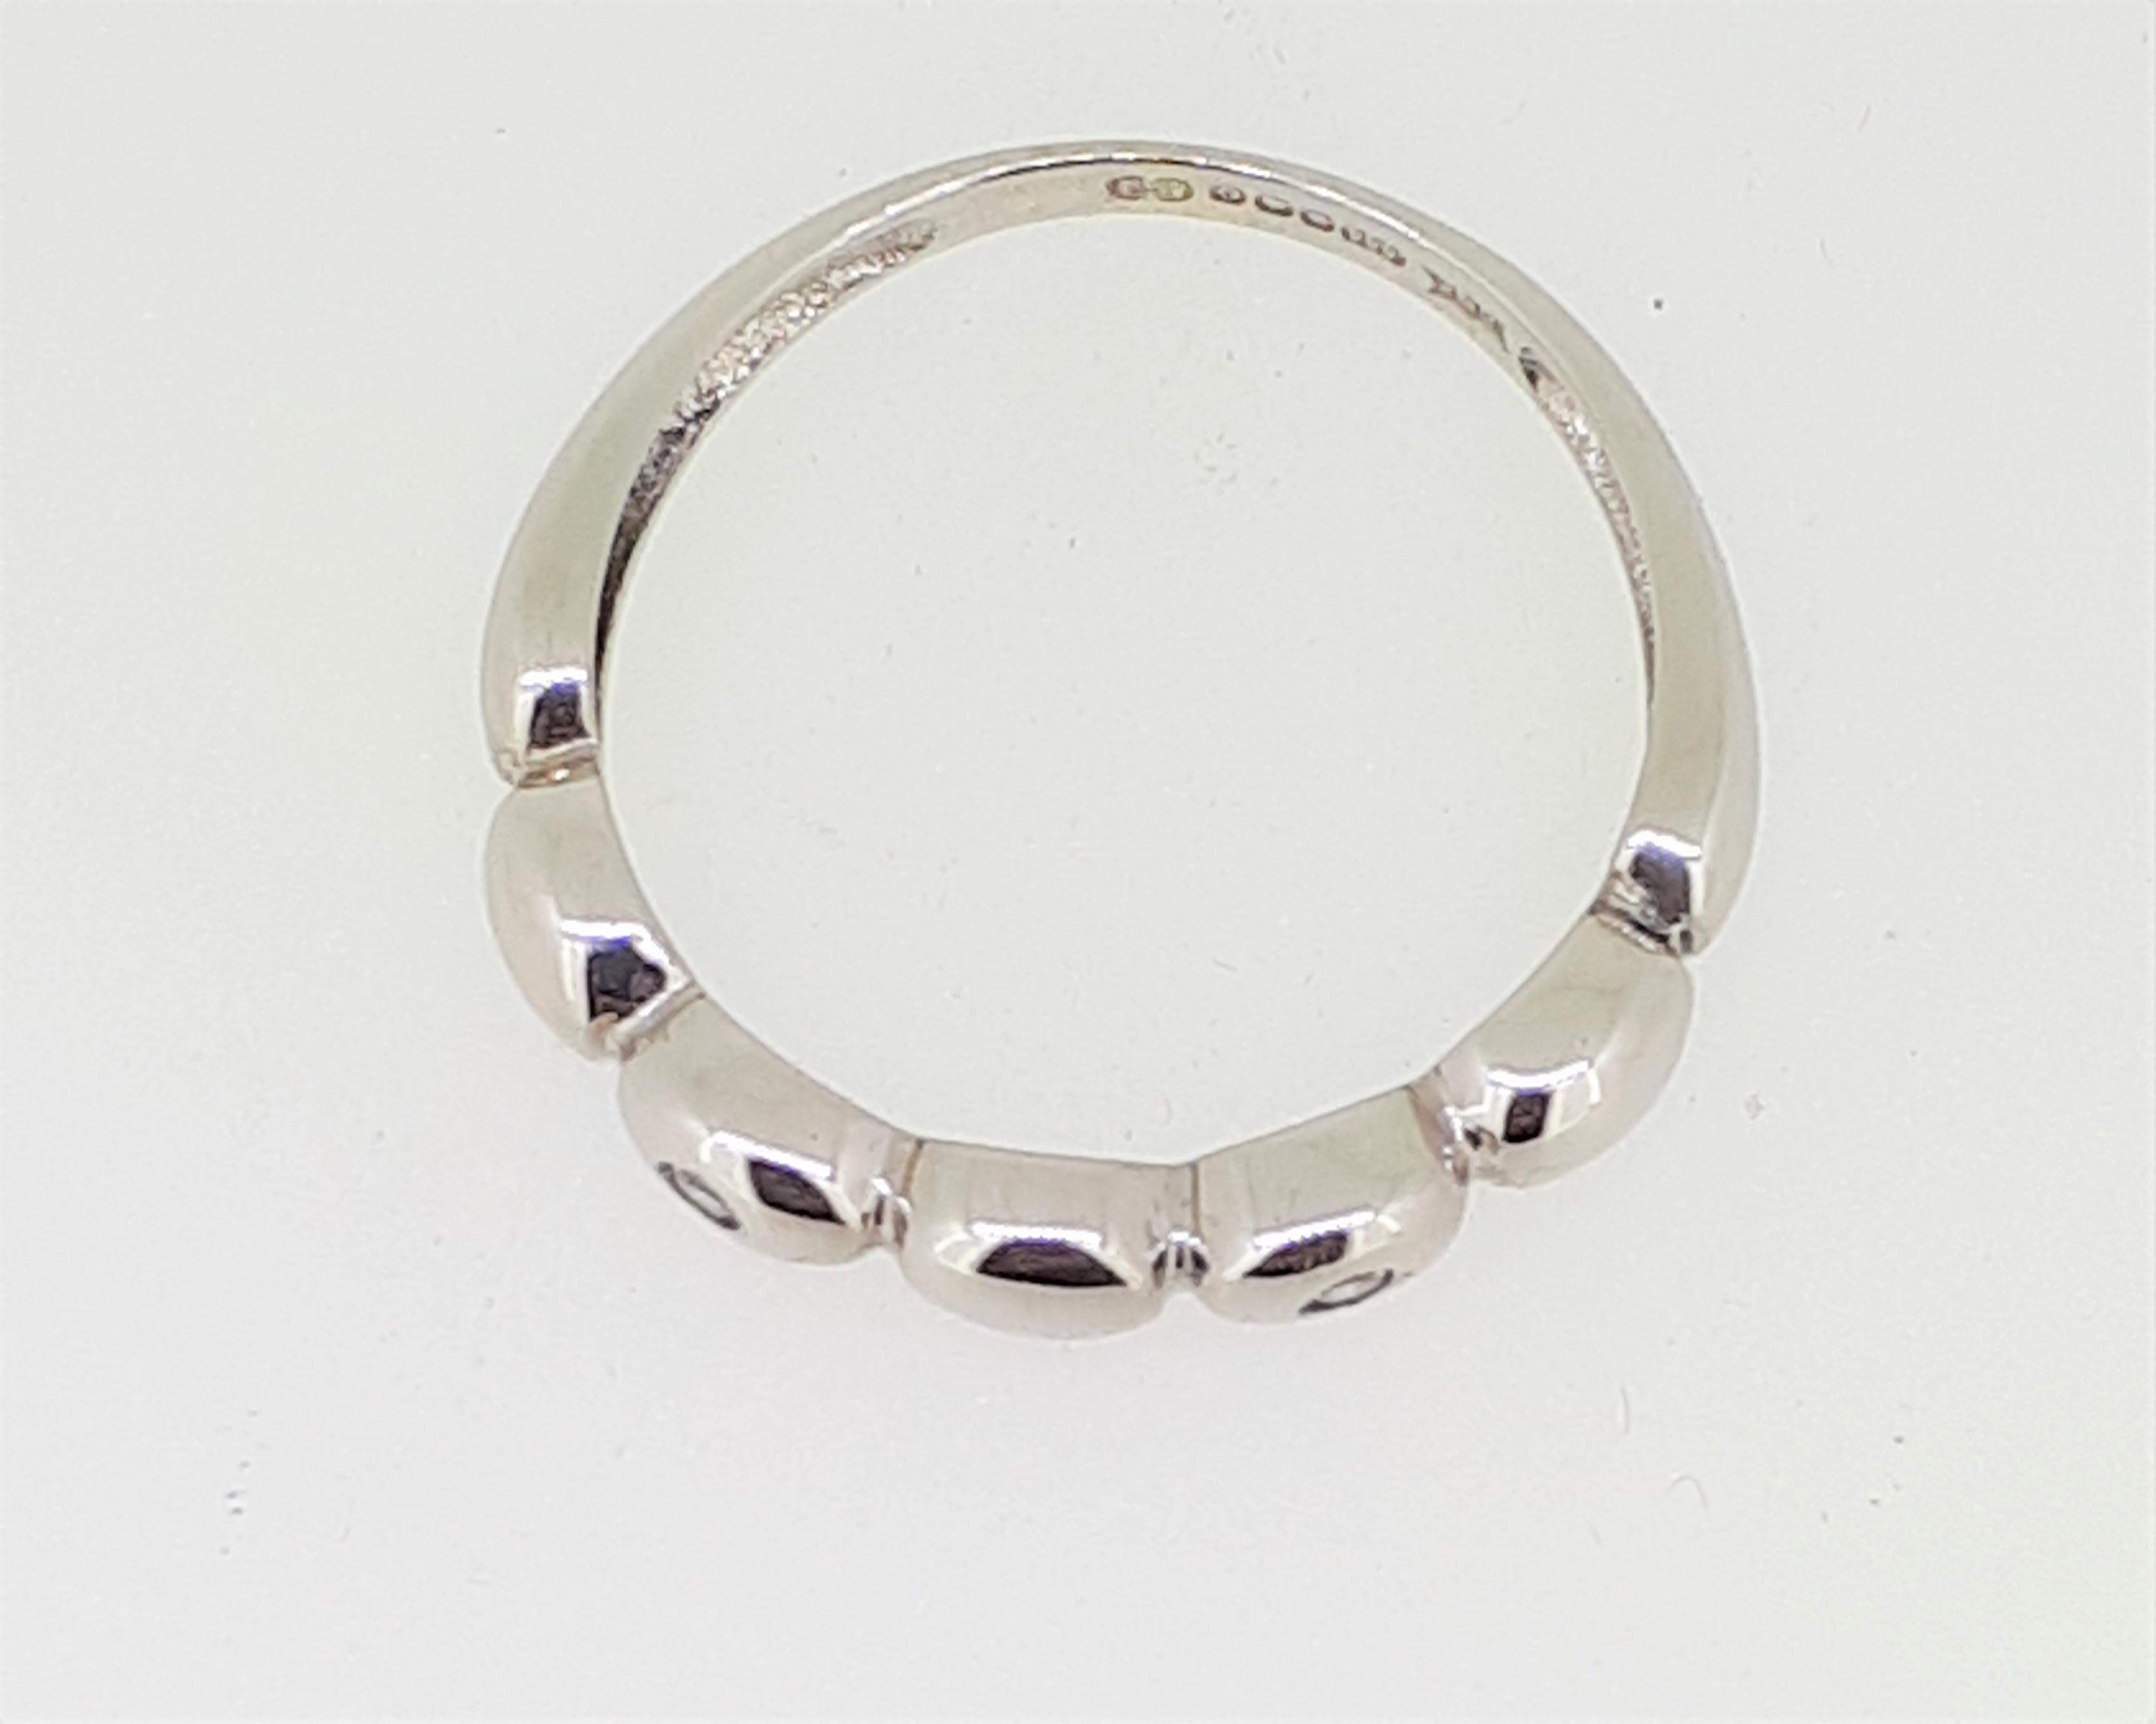 14ct (585) White Gold & Diamond Five Bead Ring - Image 2 of 6